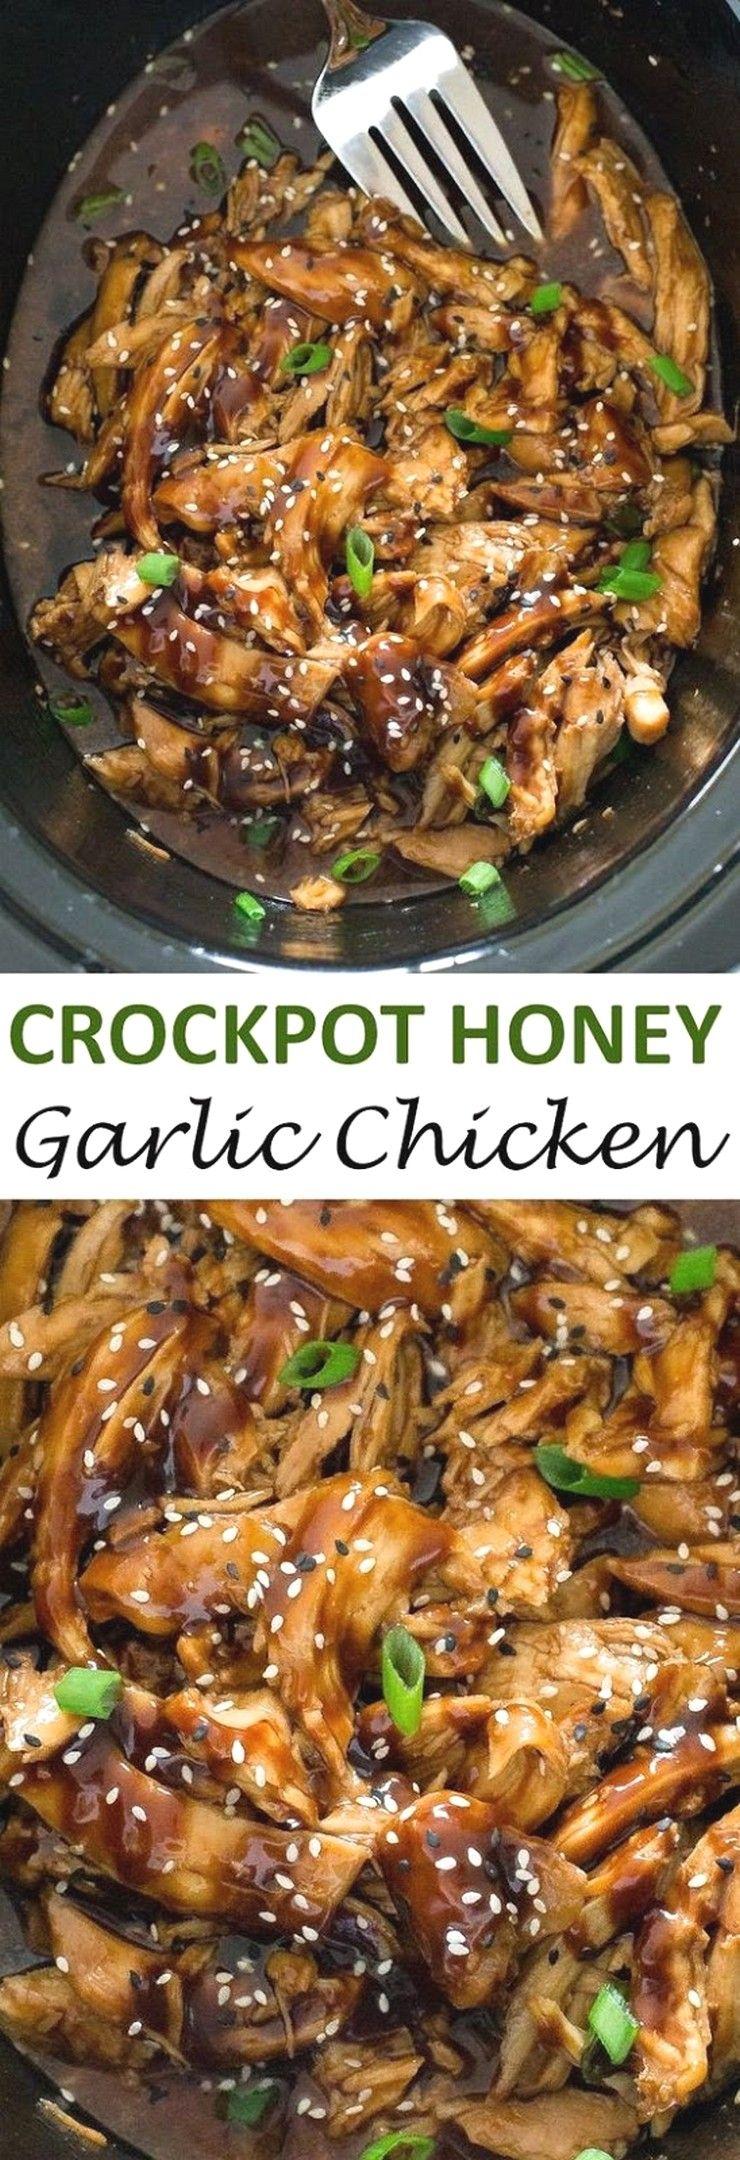 Slow Cooker Honey Garlic Chicken | Crockpot Recipes #healthycrockpotchickenrecipes